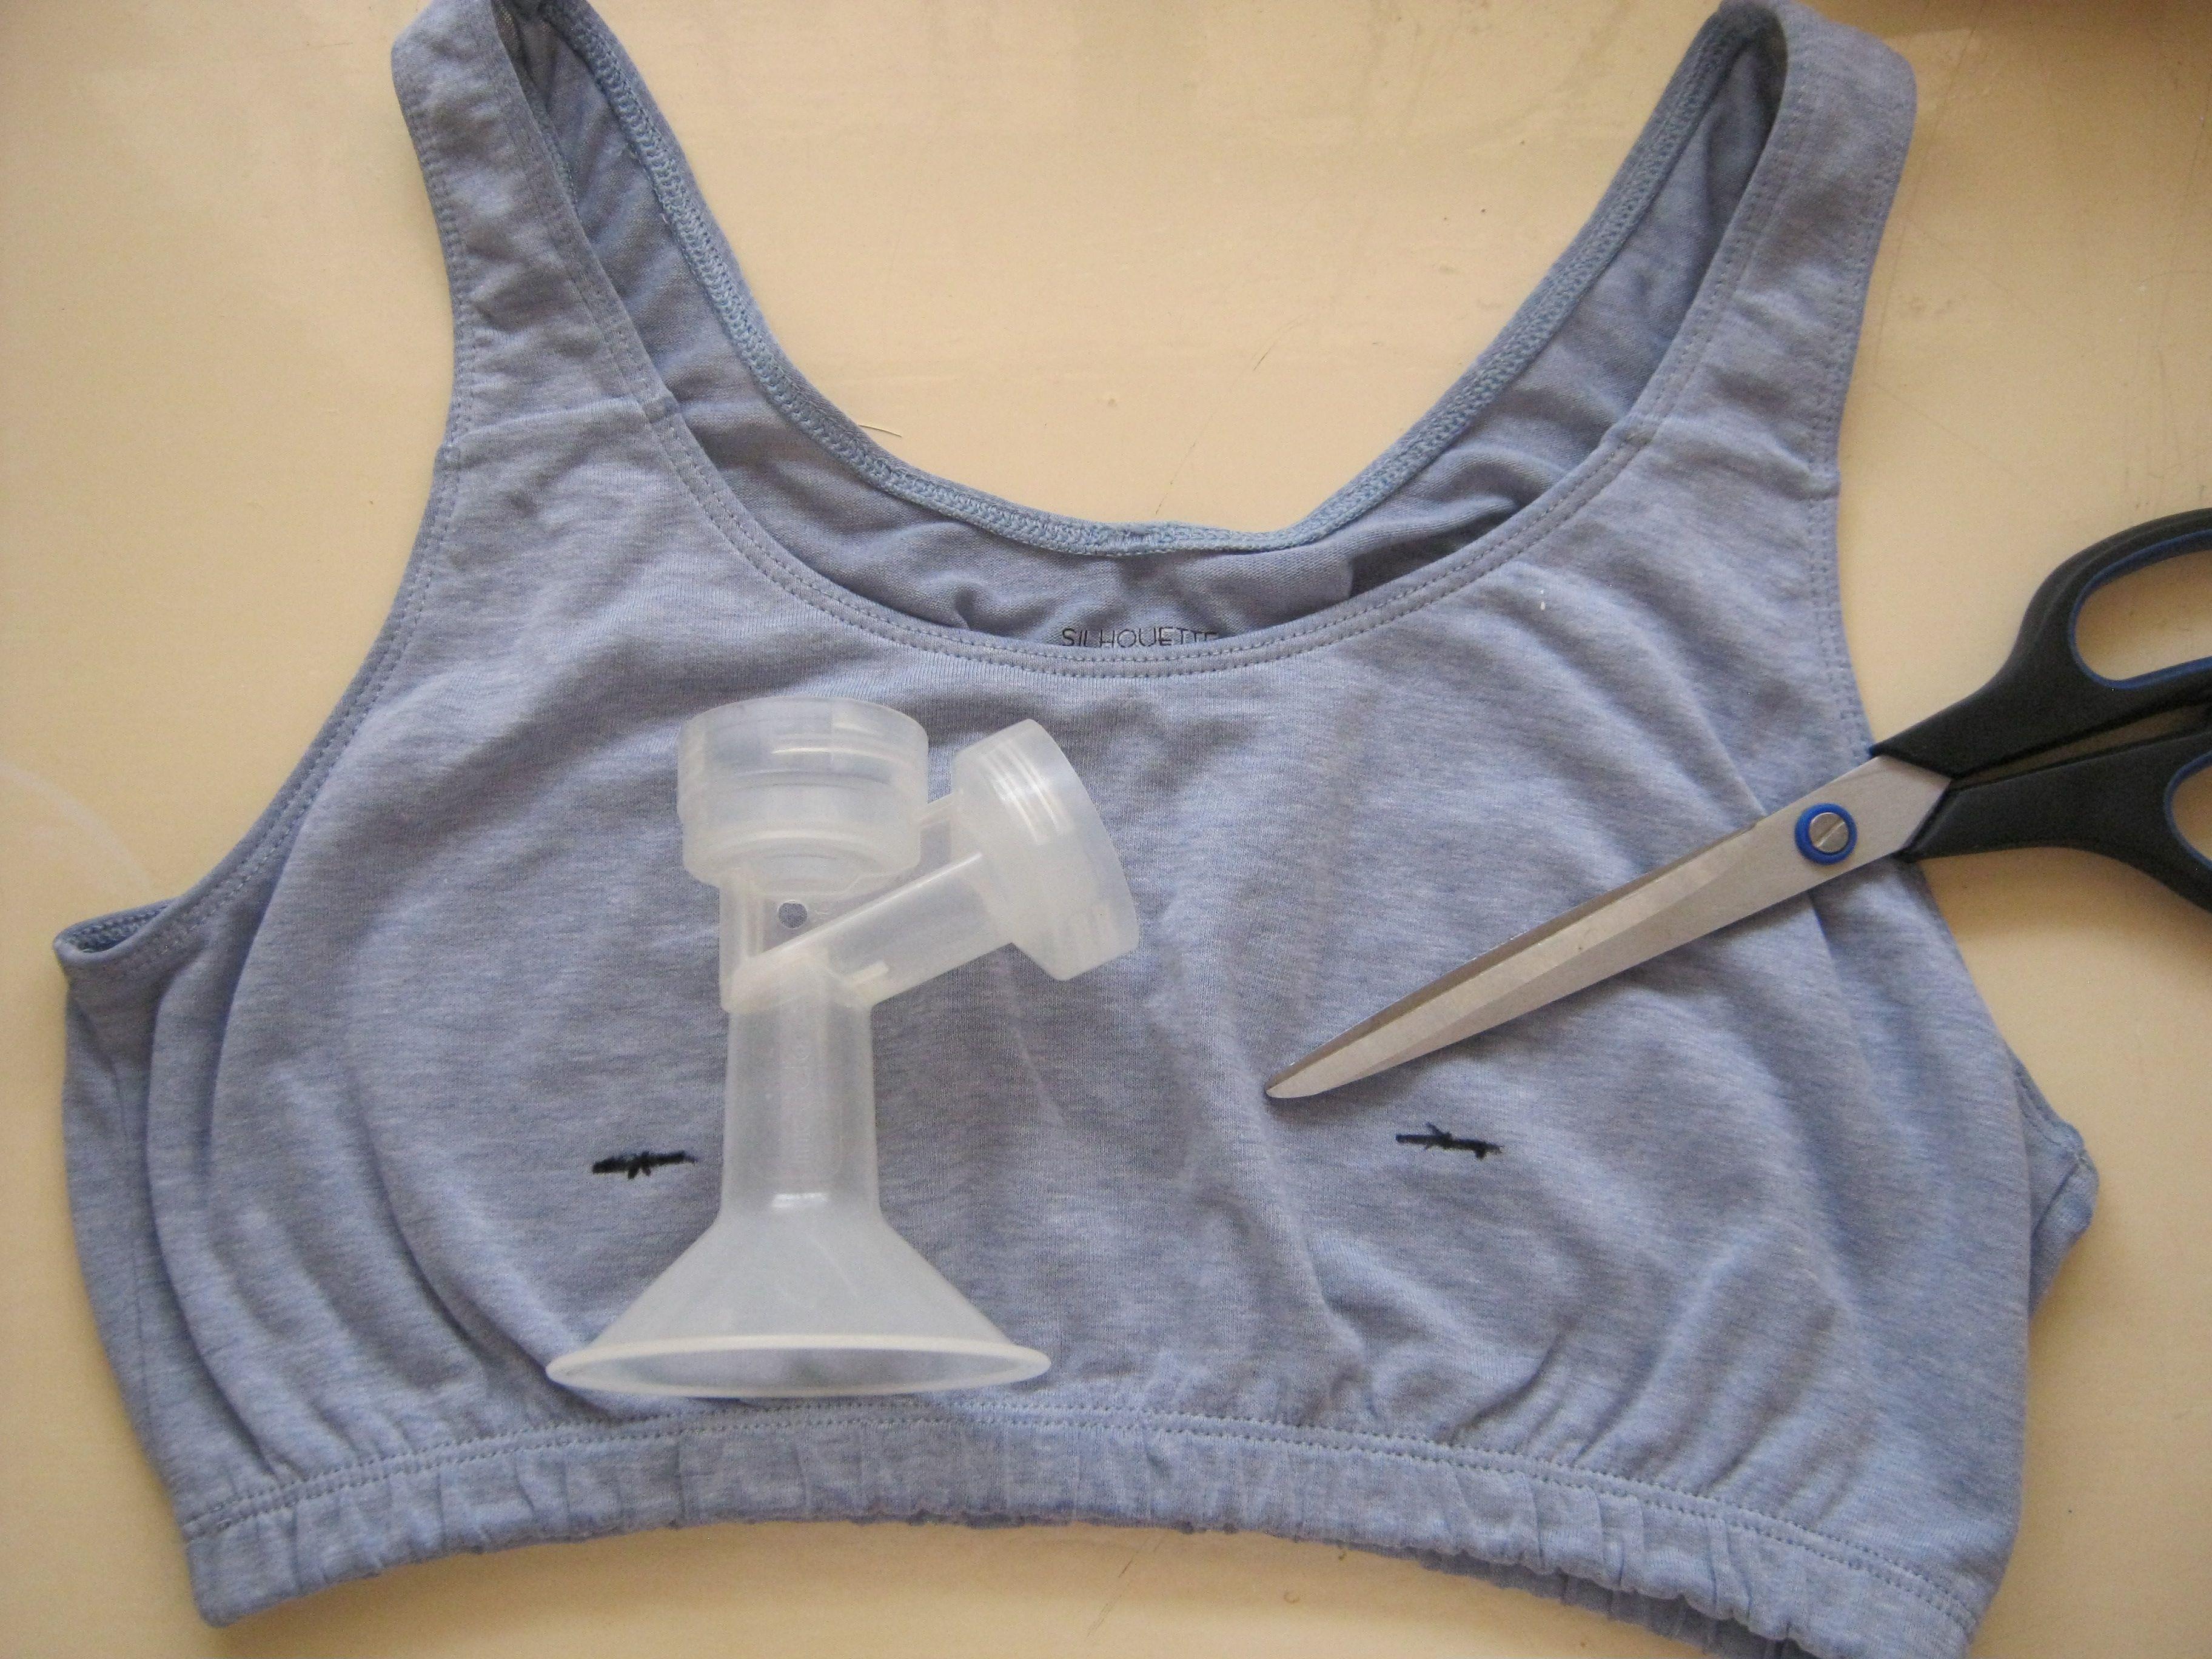 How to make a pumping bra pumping bras breastfeeding